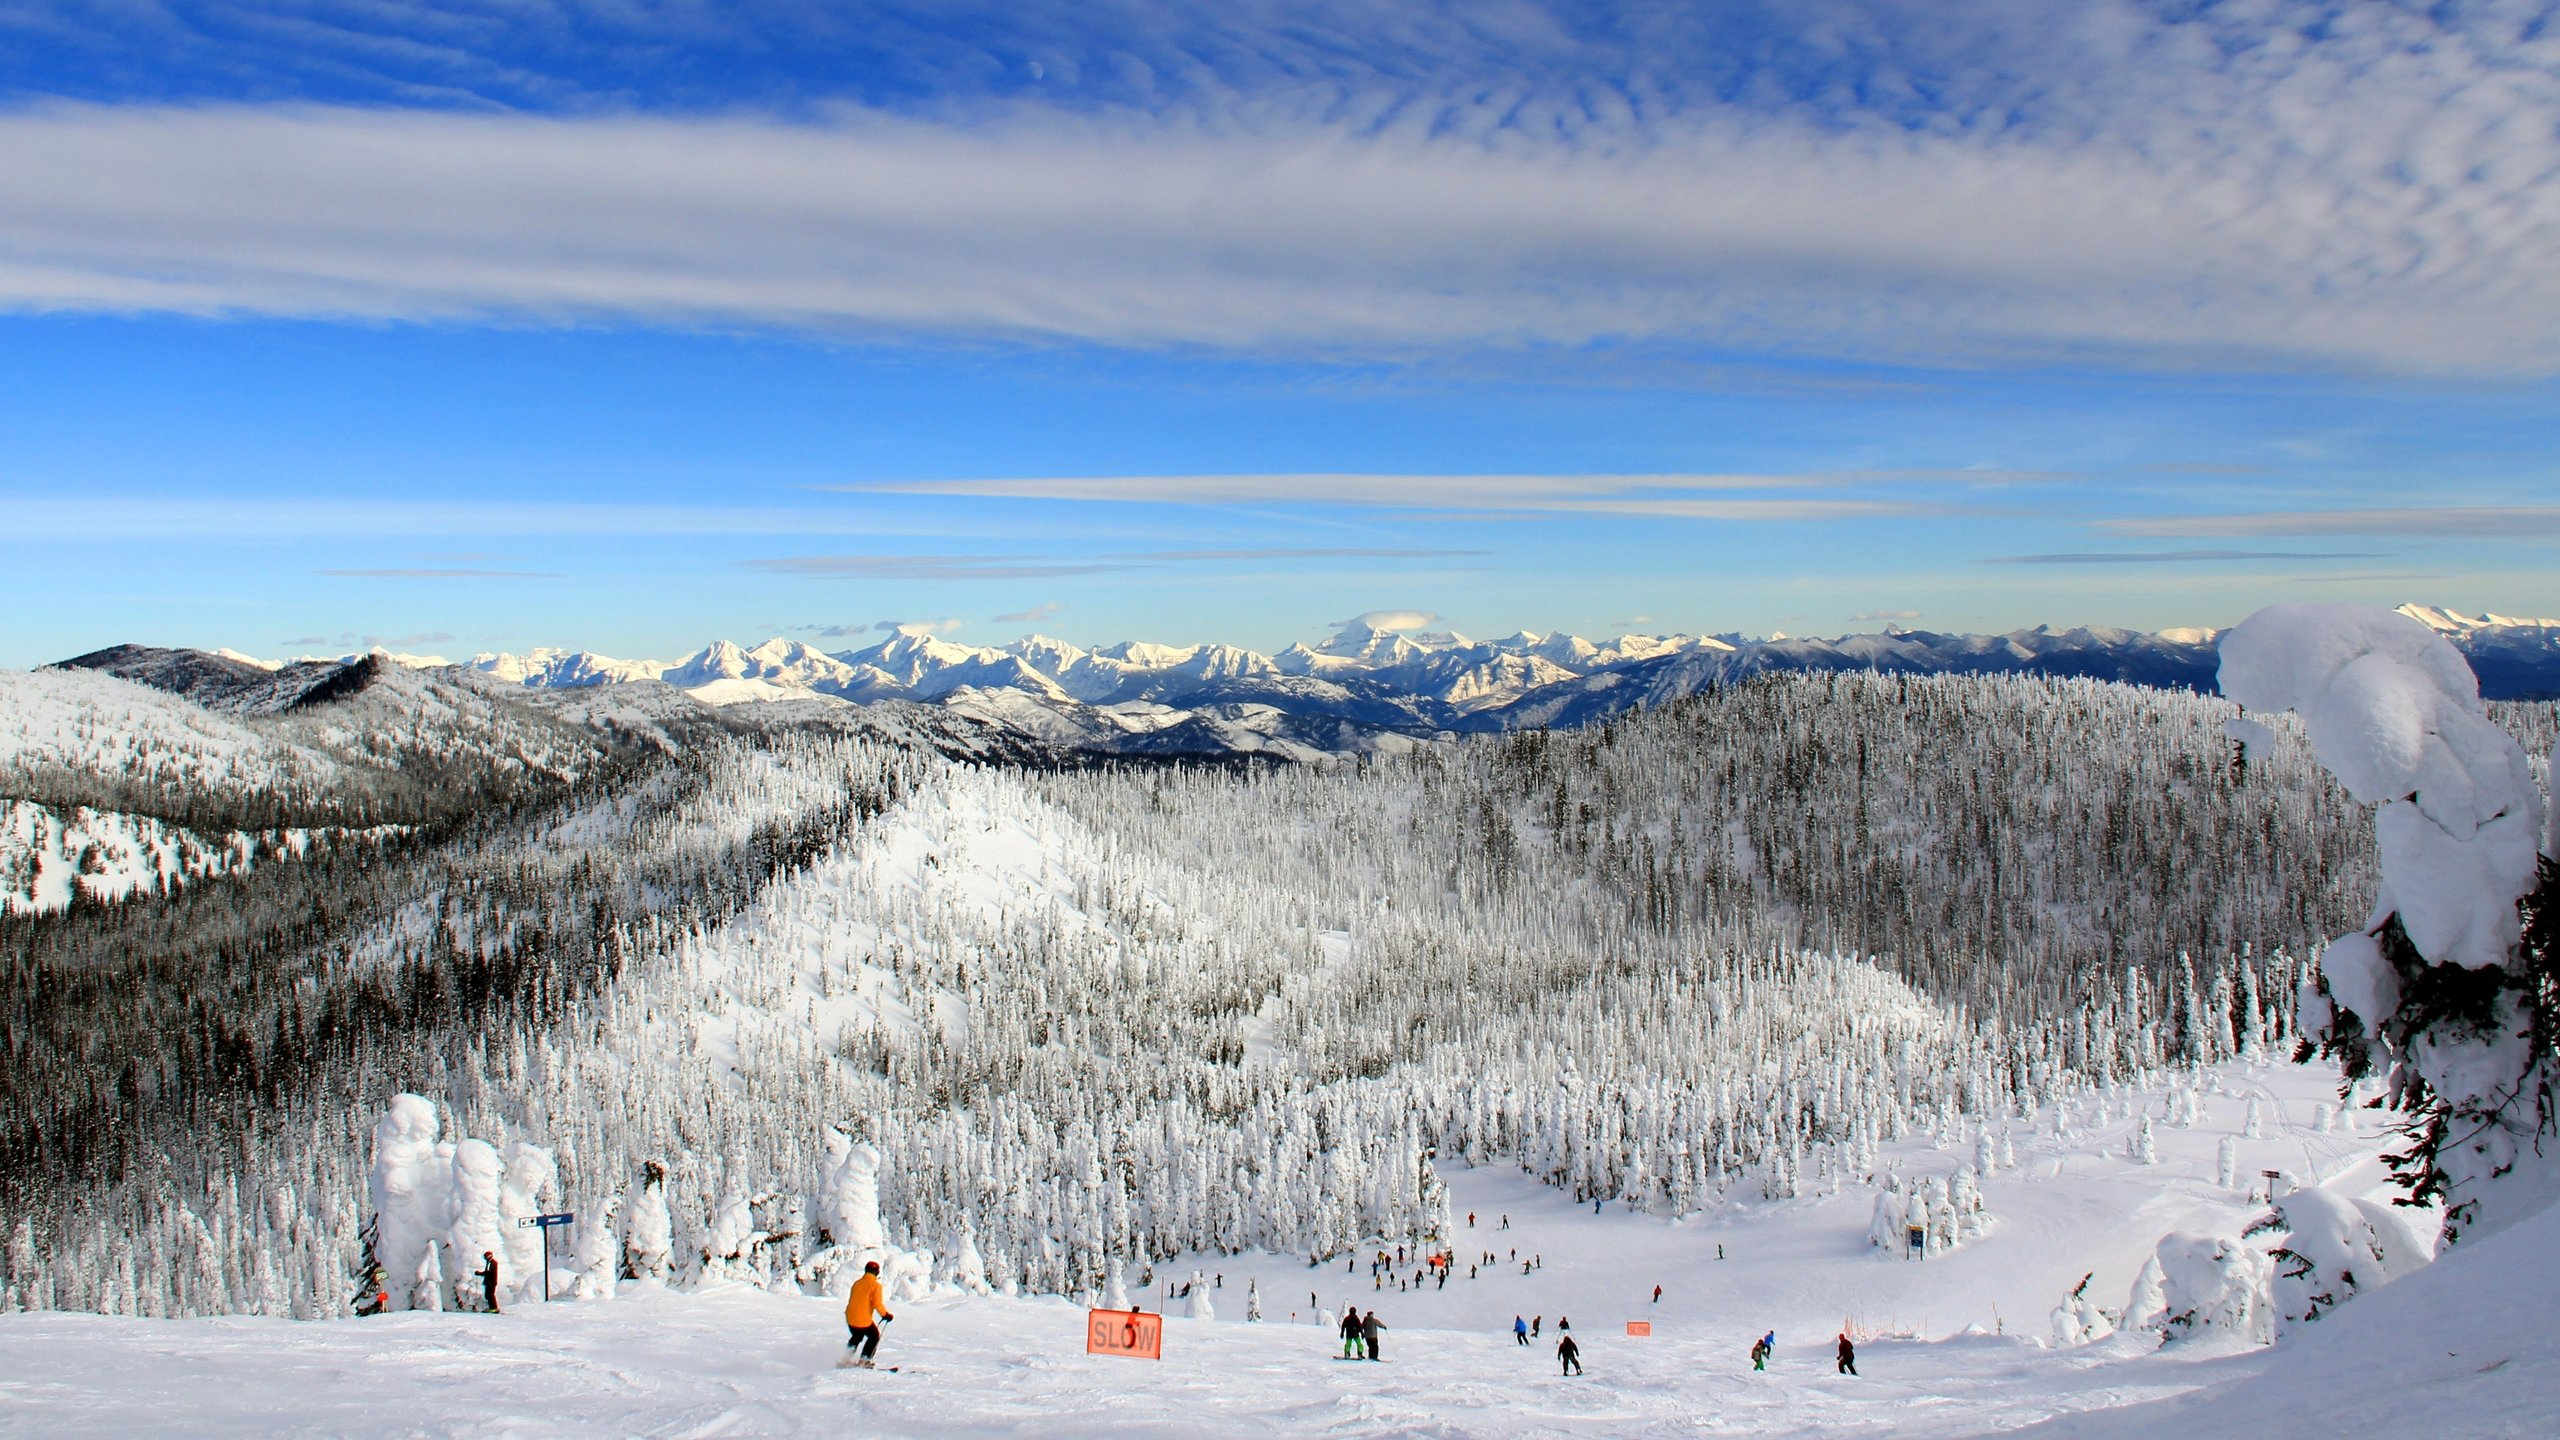 Flathead County, Montana, United States of America